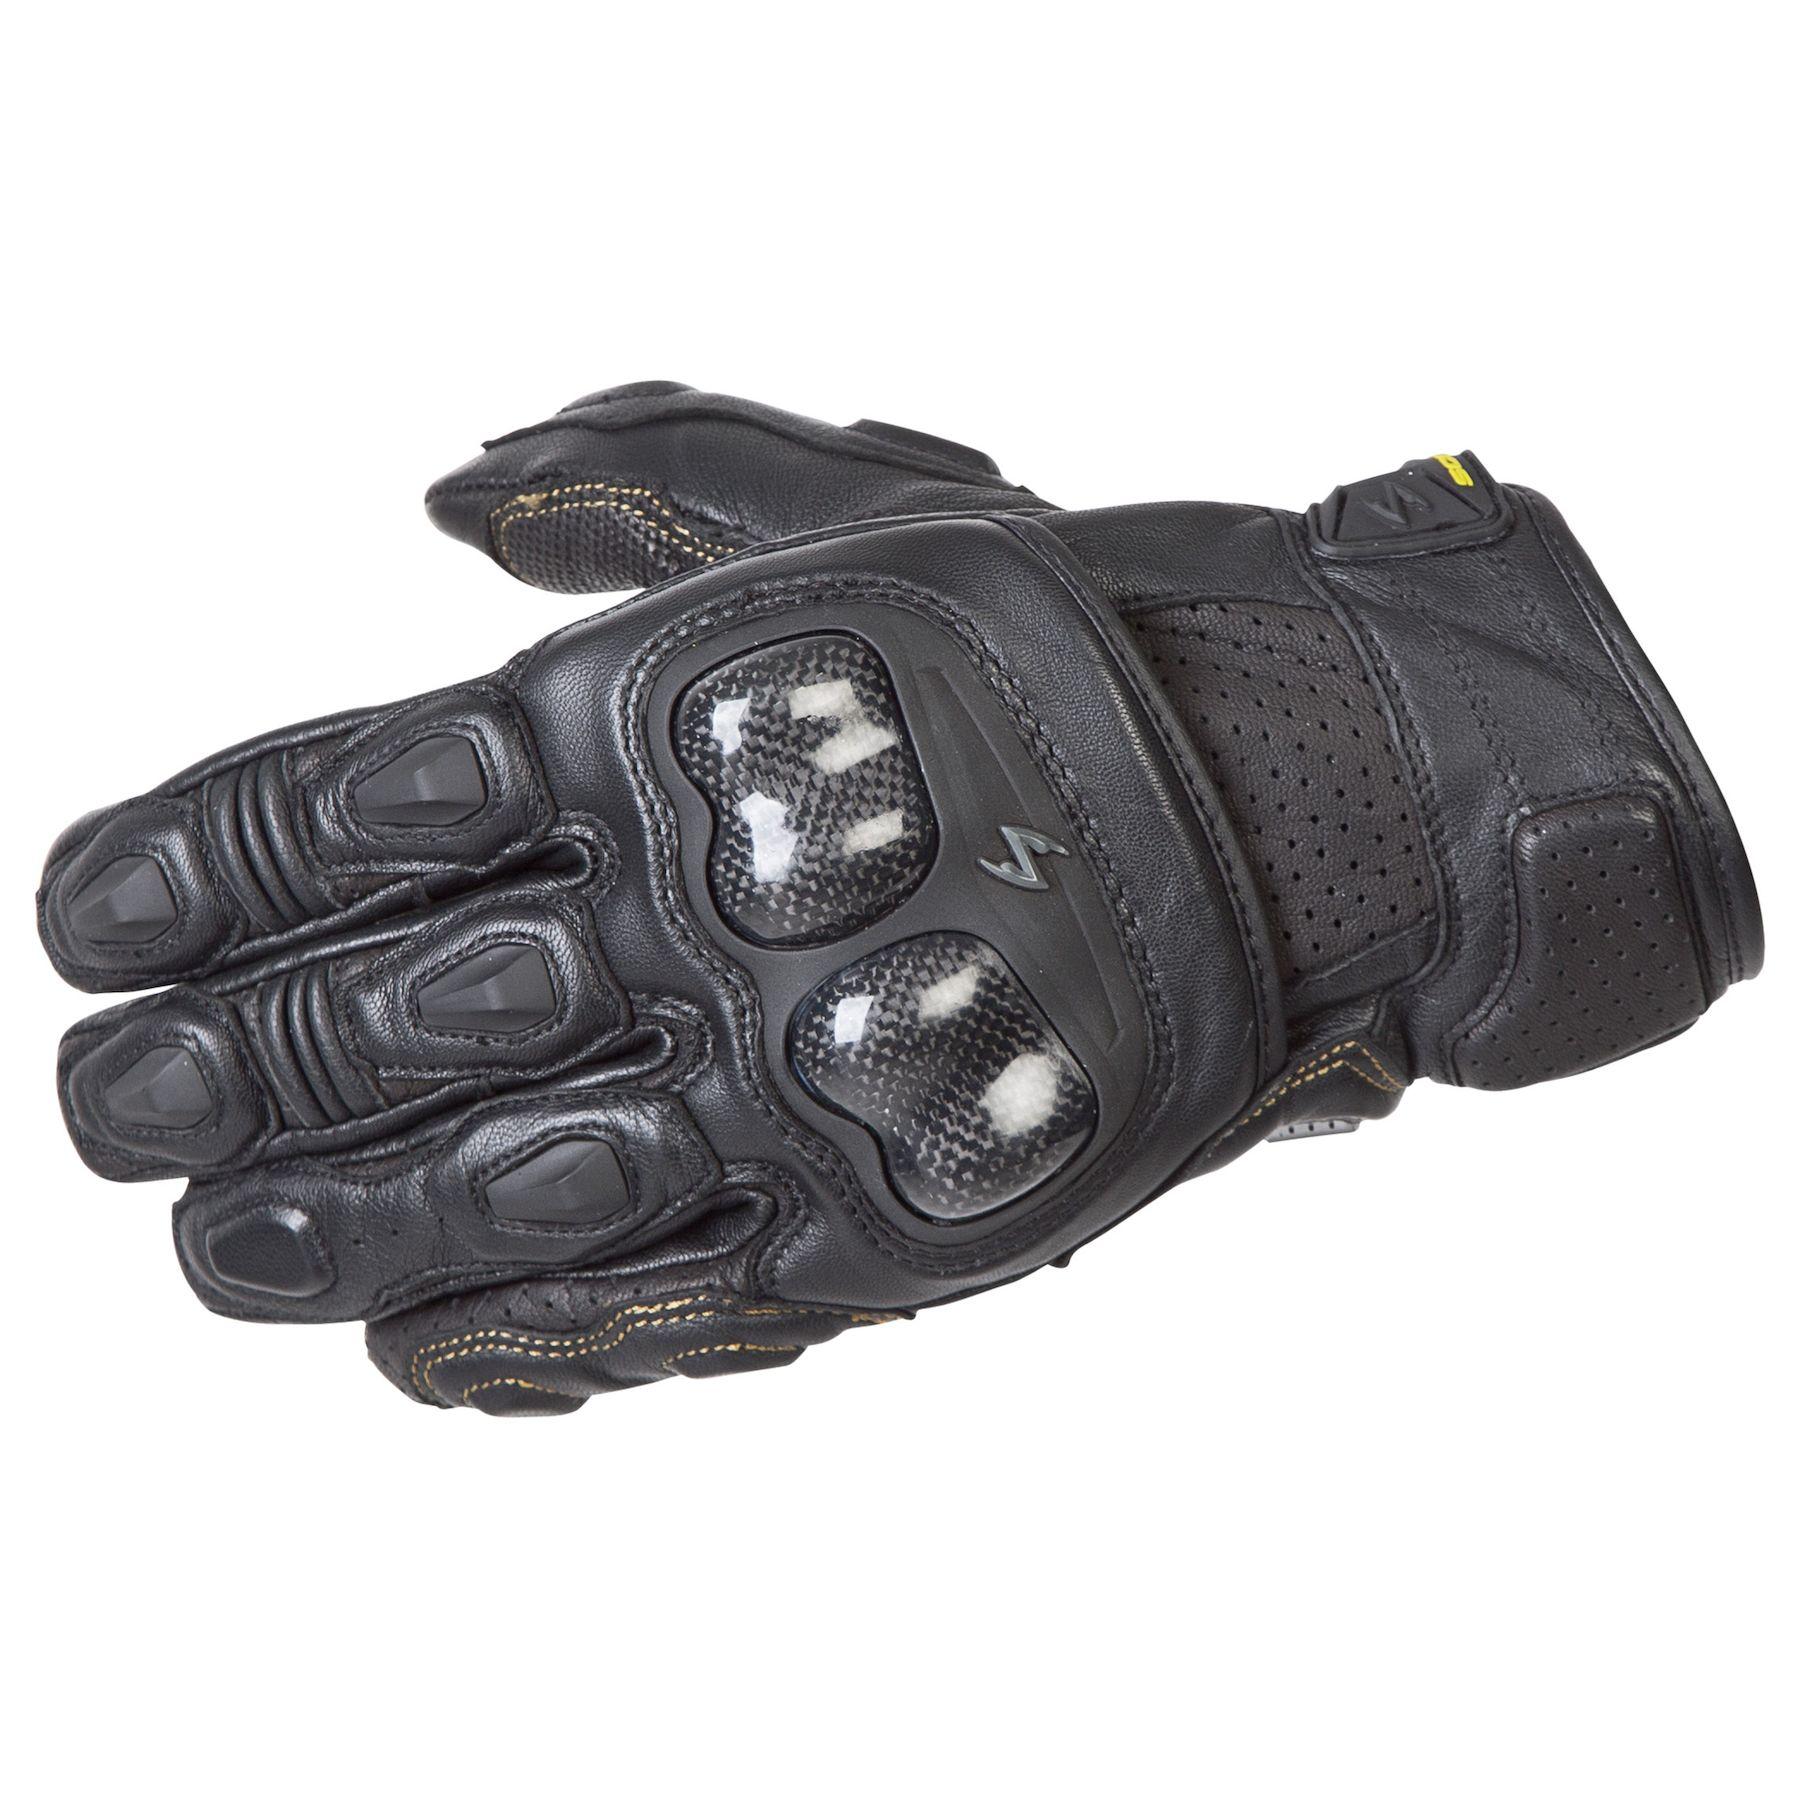 SCORPION SG3 MK II Gloves Leather Gauntlet RED BLACK